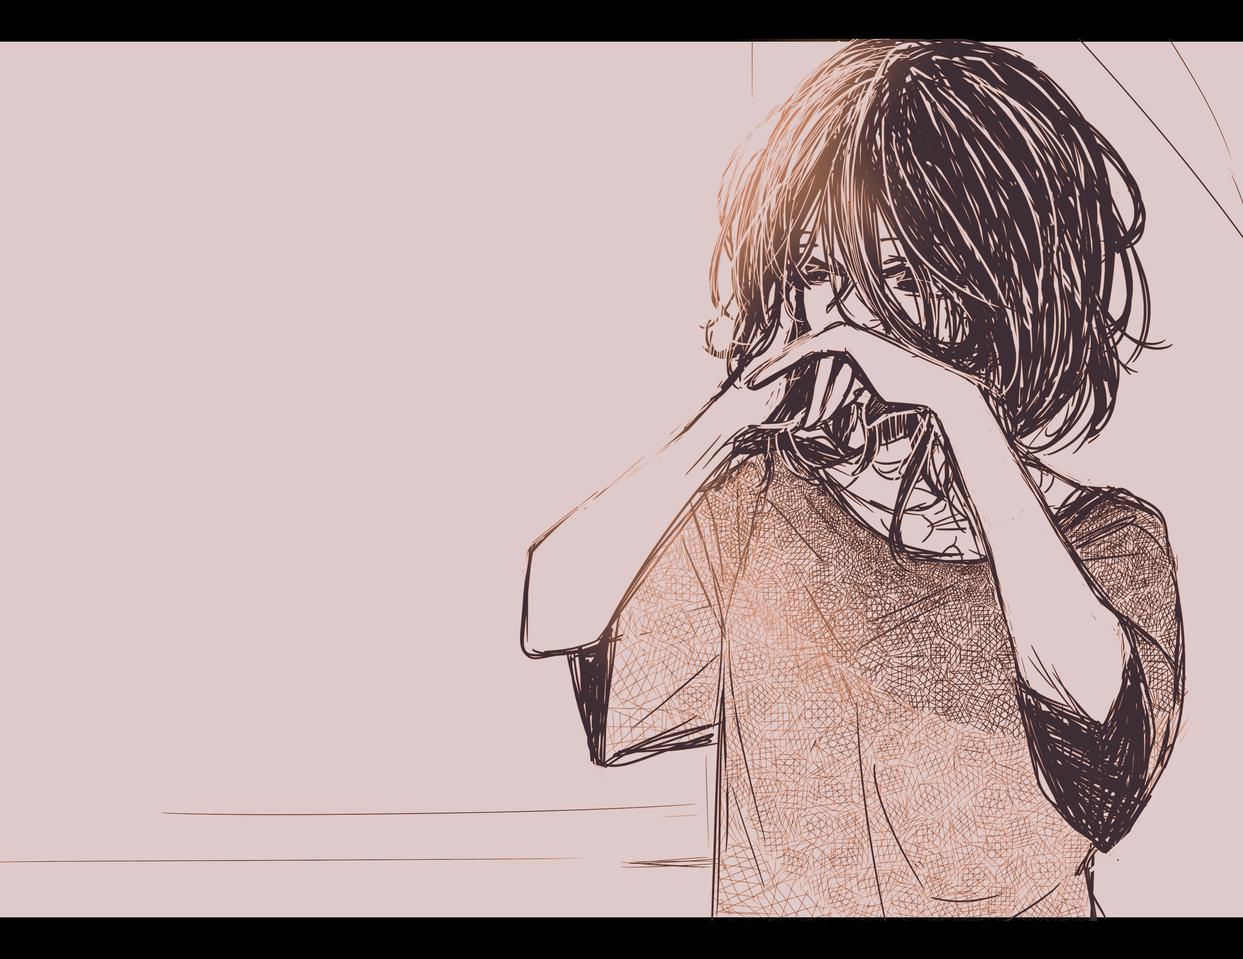 ANta Illust of AkiHaru monochrome sketch oc